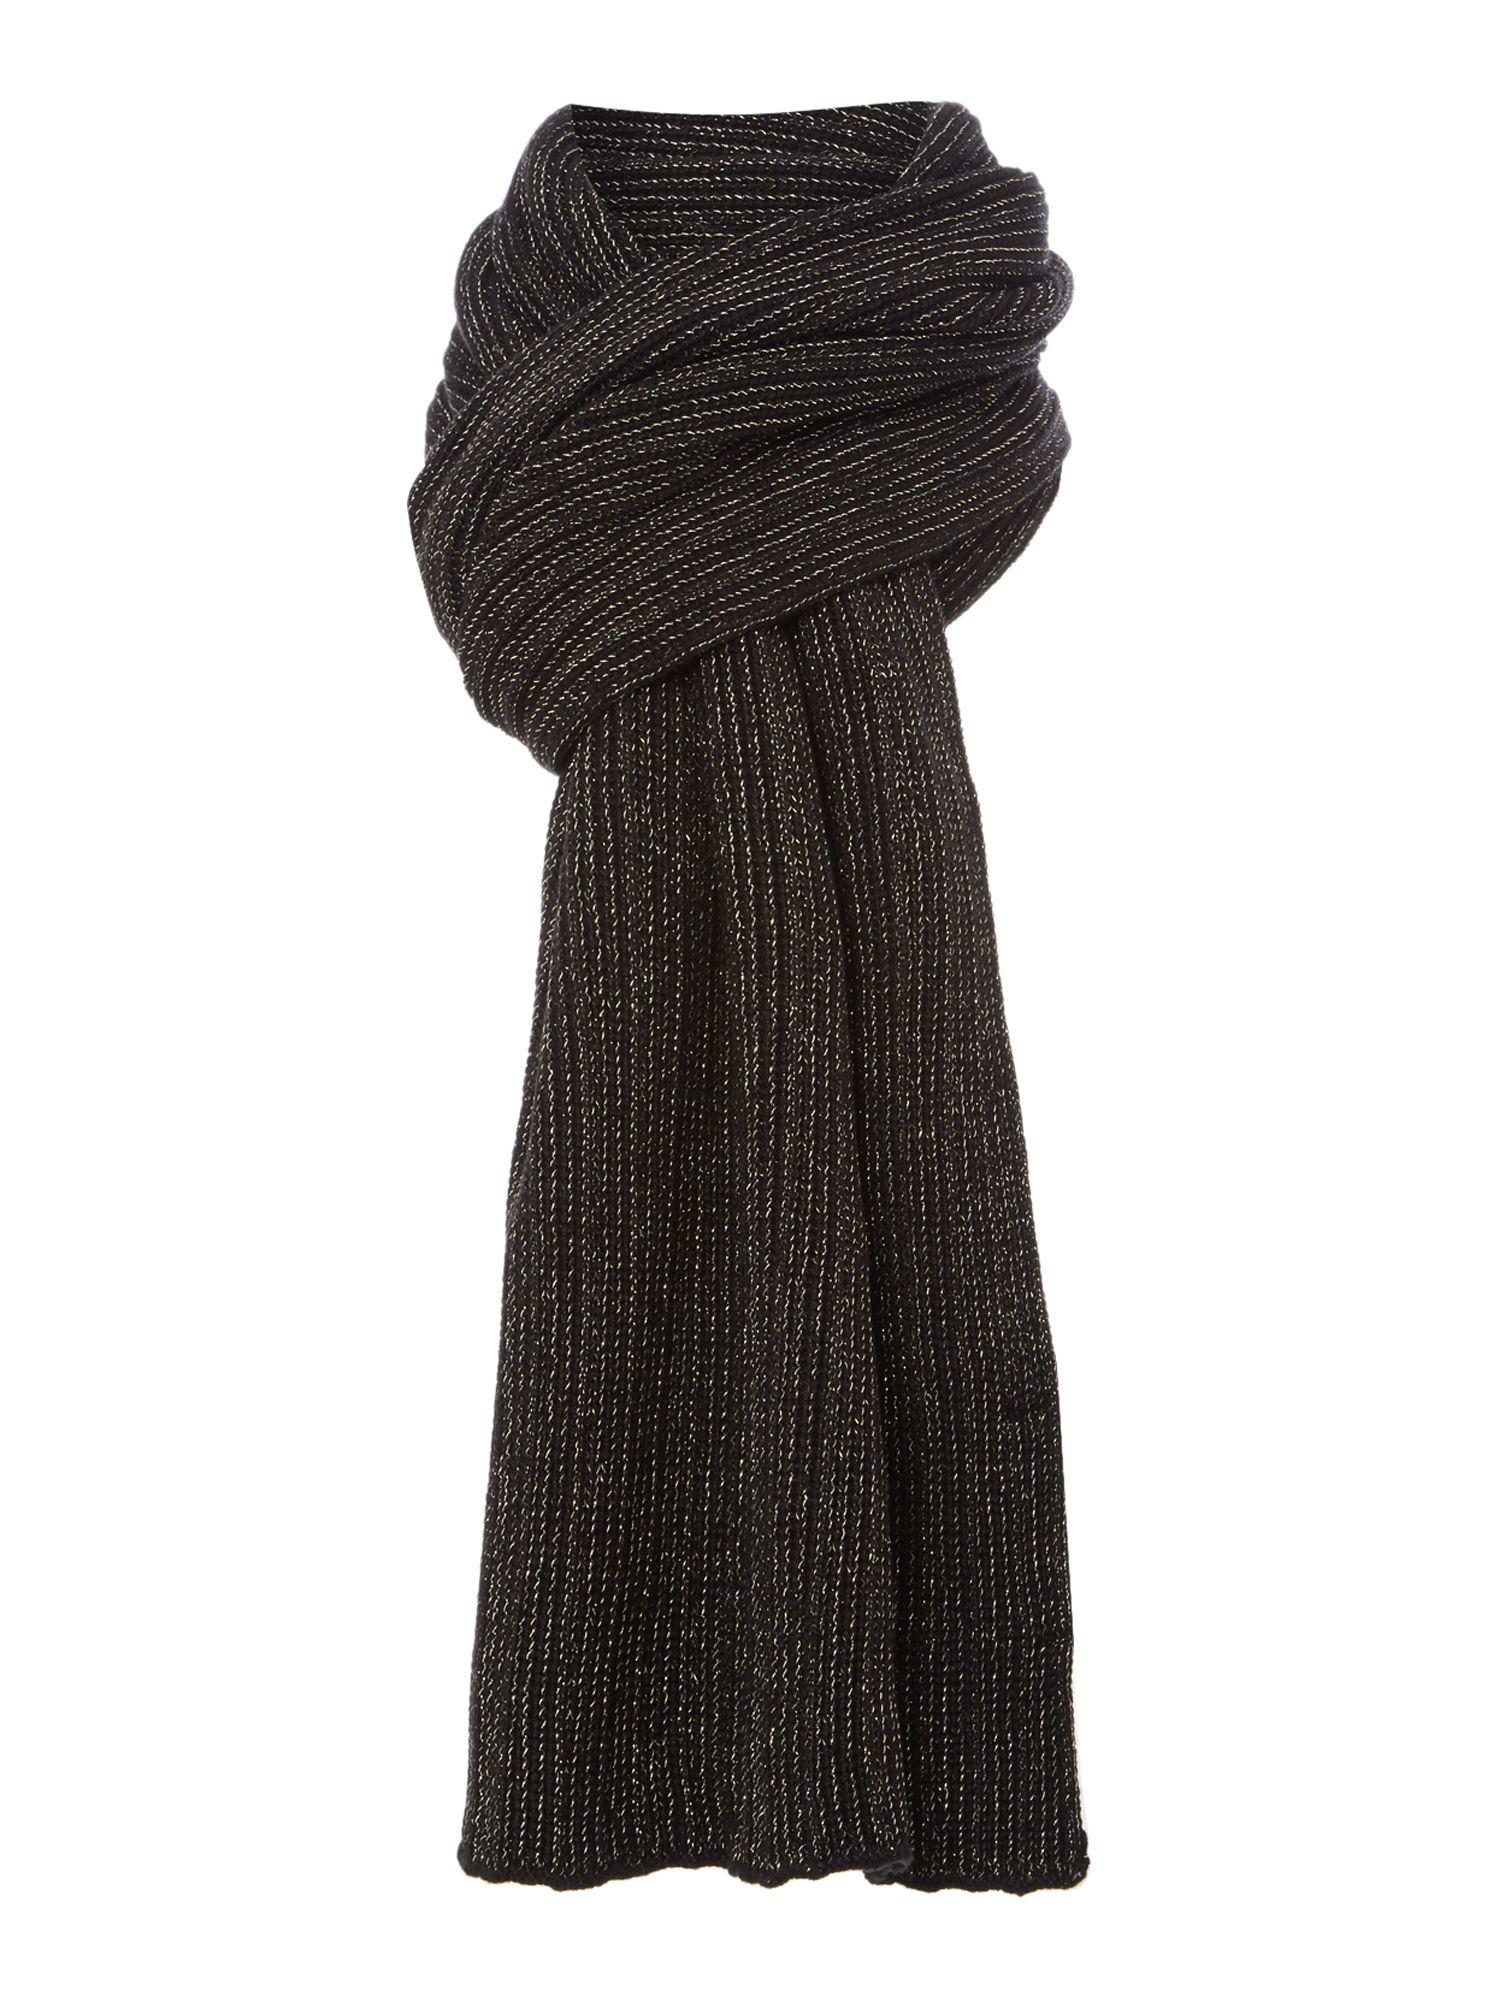 biba black lurex scarf in black save 61 lyst